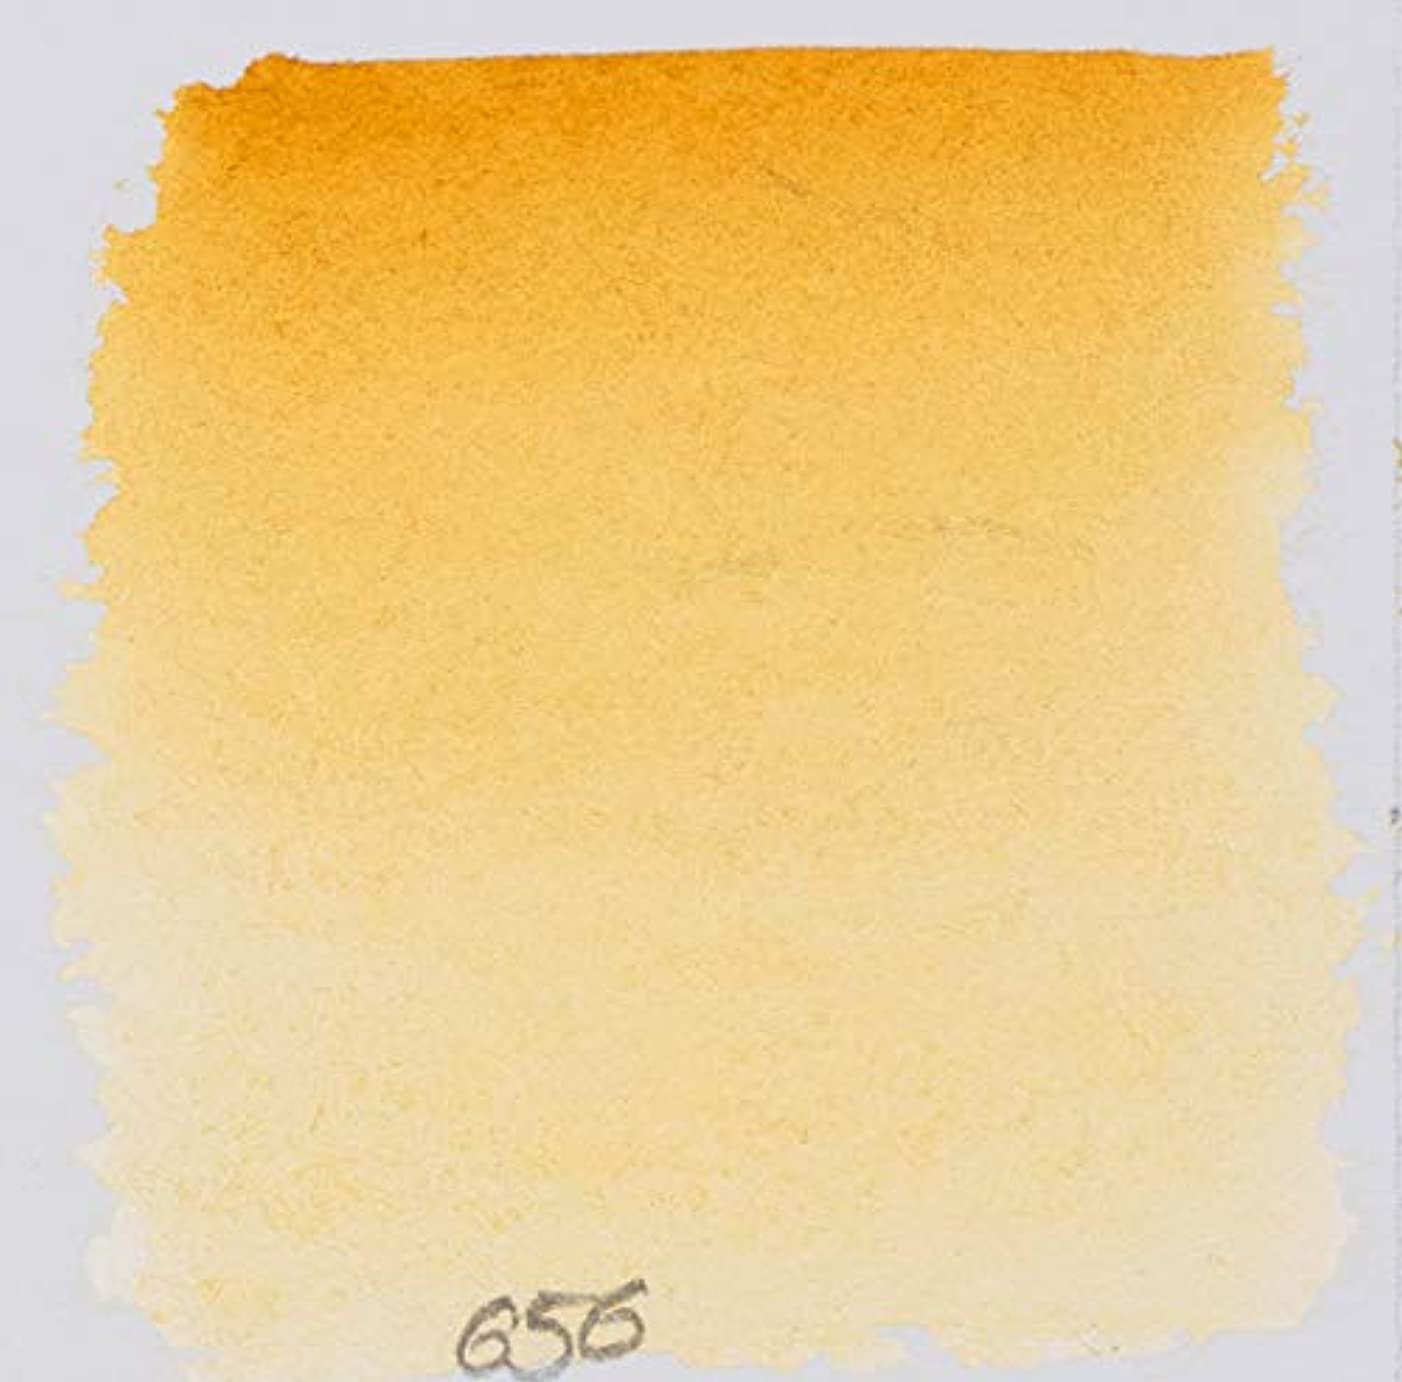 Schmincke Horadam Aquarell Watercolor - 15 ml Tube - Yellow Raw Ochre